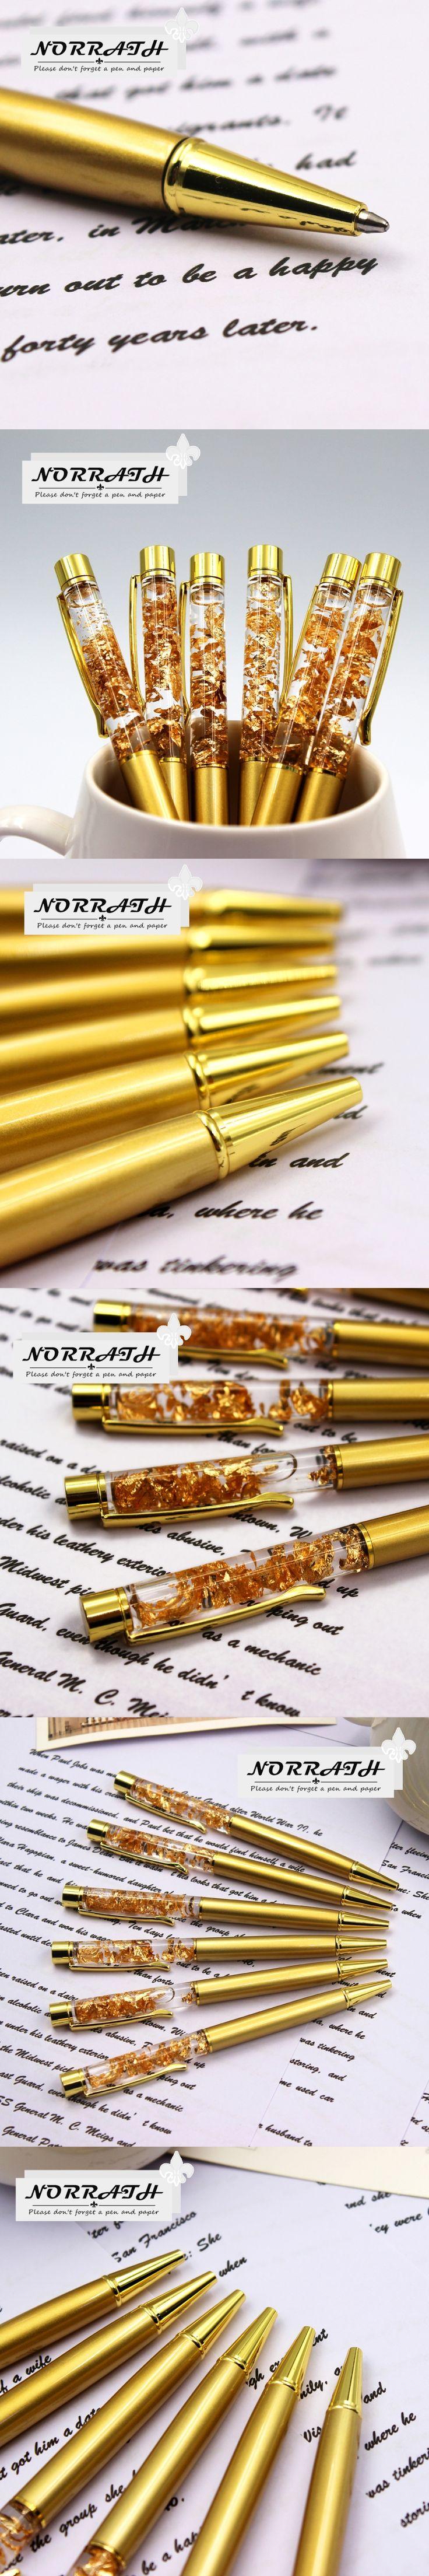 NORRATH Stationery Metal Gold Foil Ballpoint Pen Luxury Pen Golden Ballpoint School Supplies Office Accessories Oily Refill 1.0